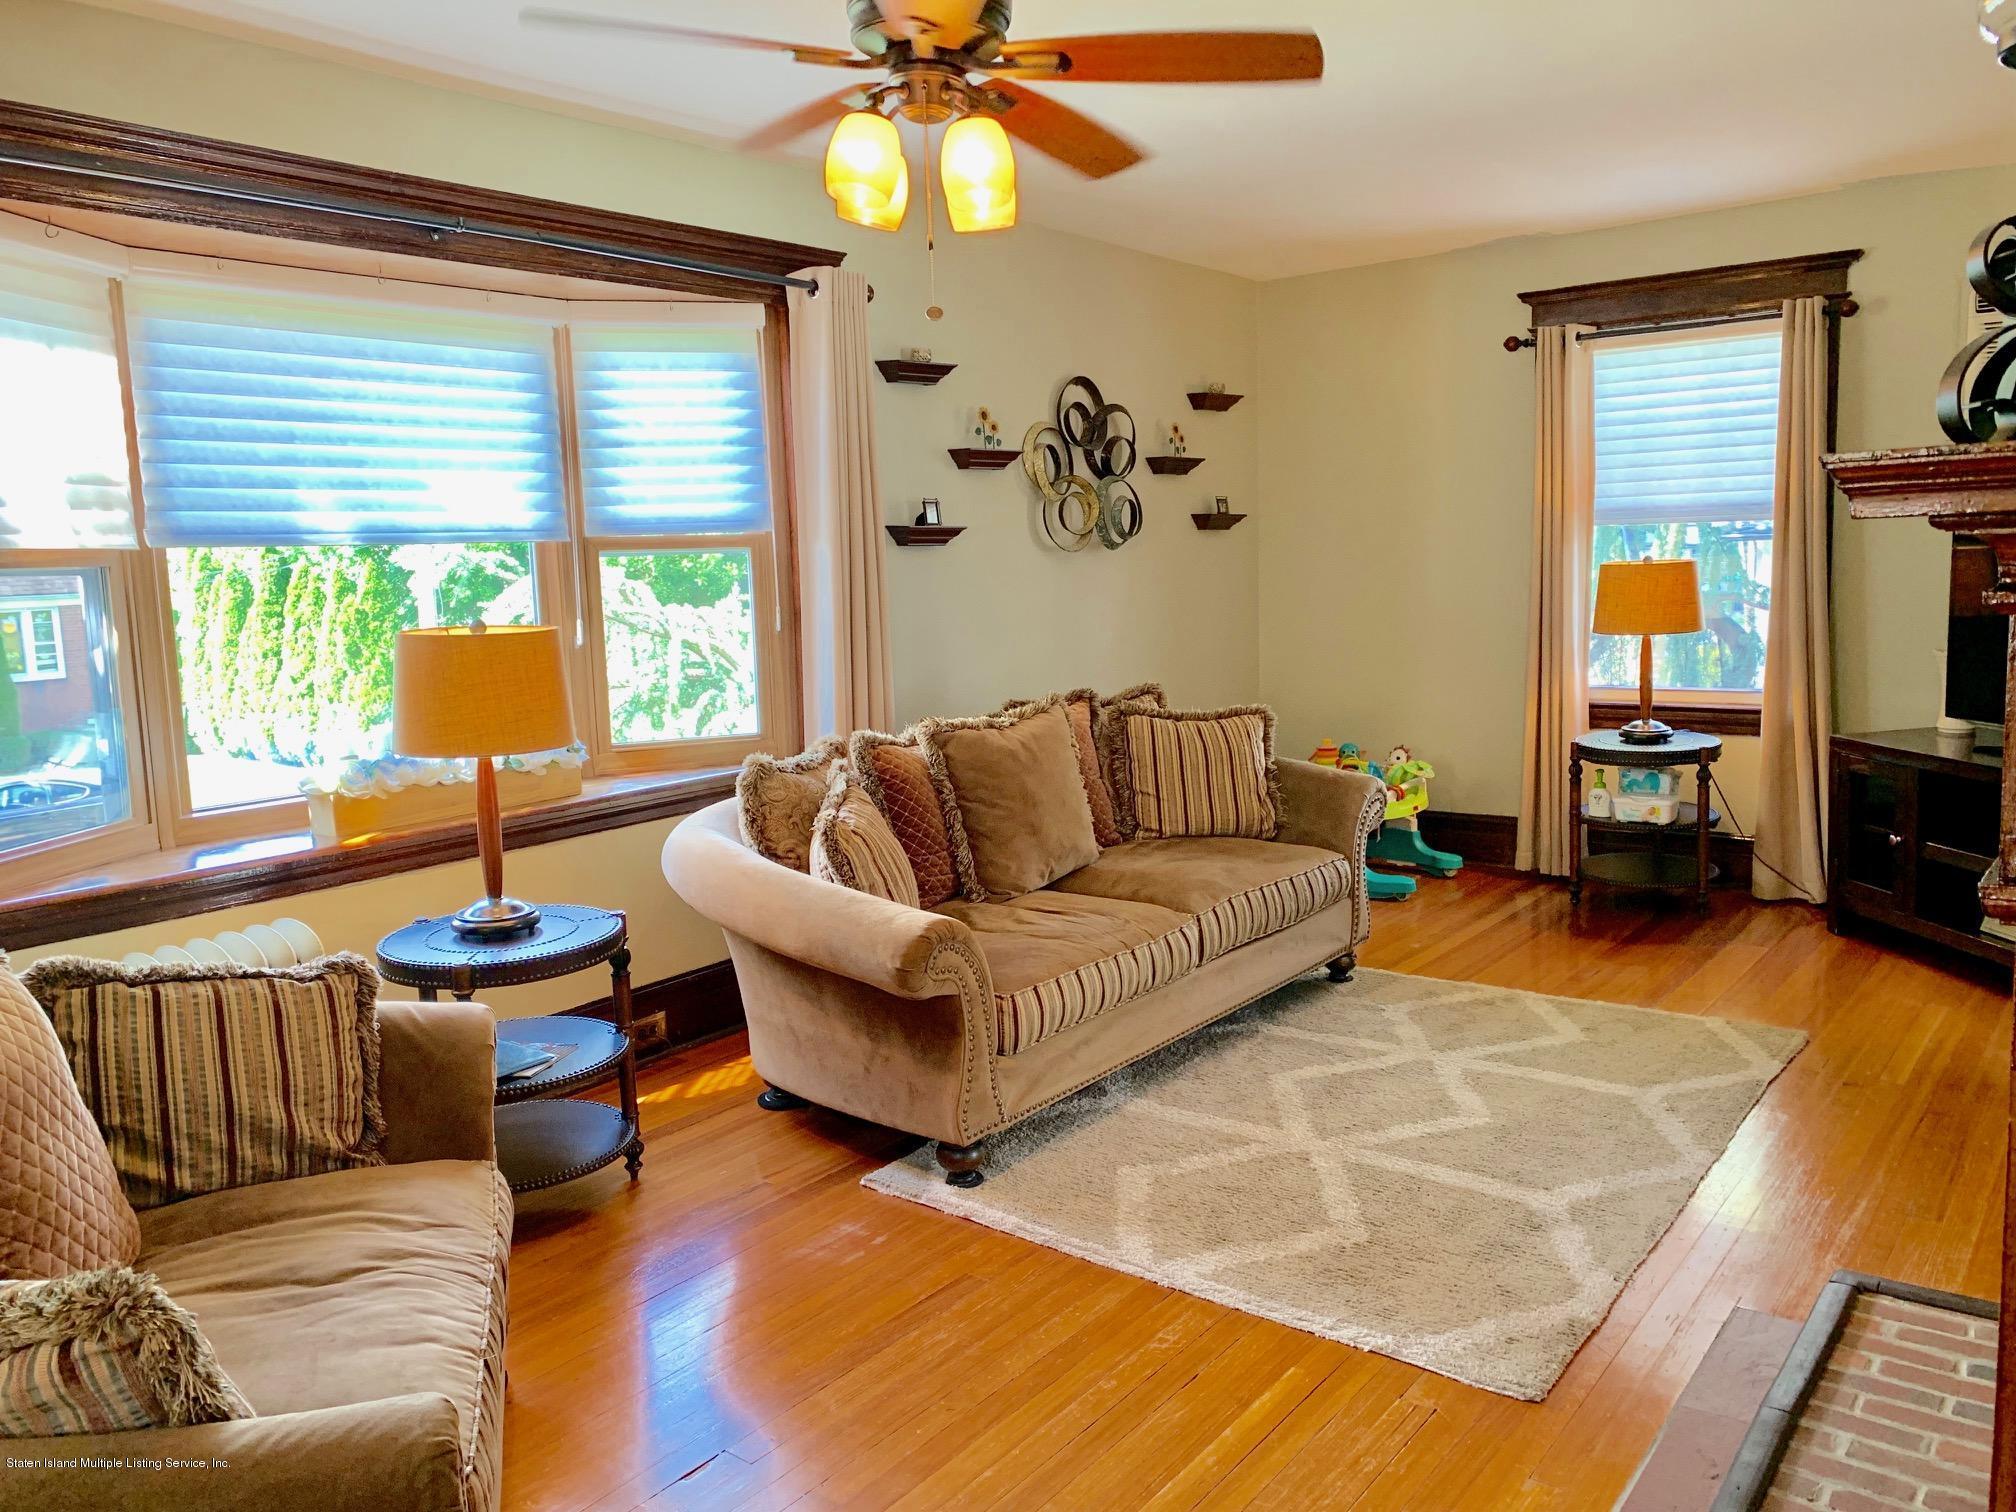 Single Family - Detached 195 Fairview Avenue  Staten Island, NY 10314, MLS-1132423-7